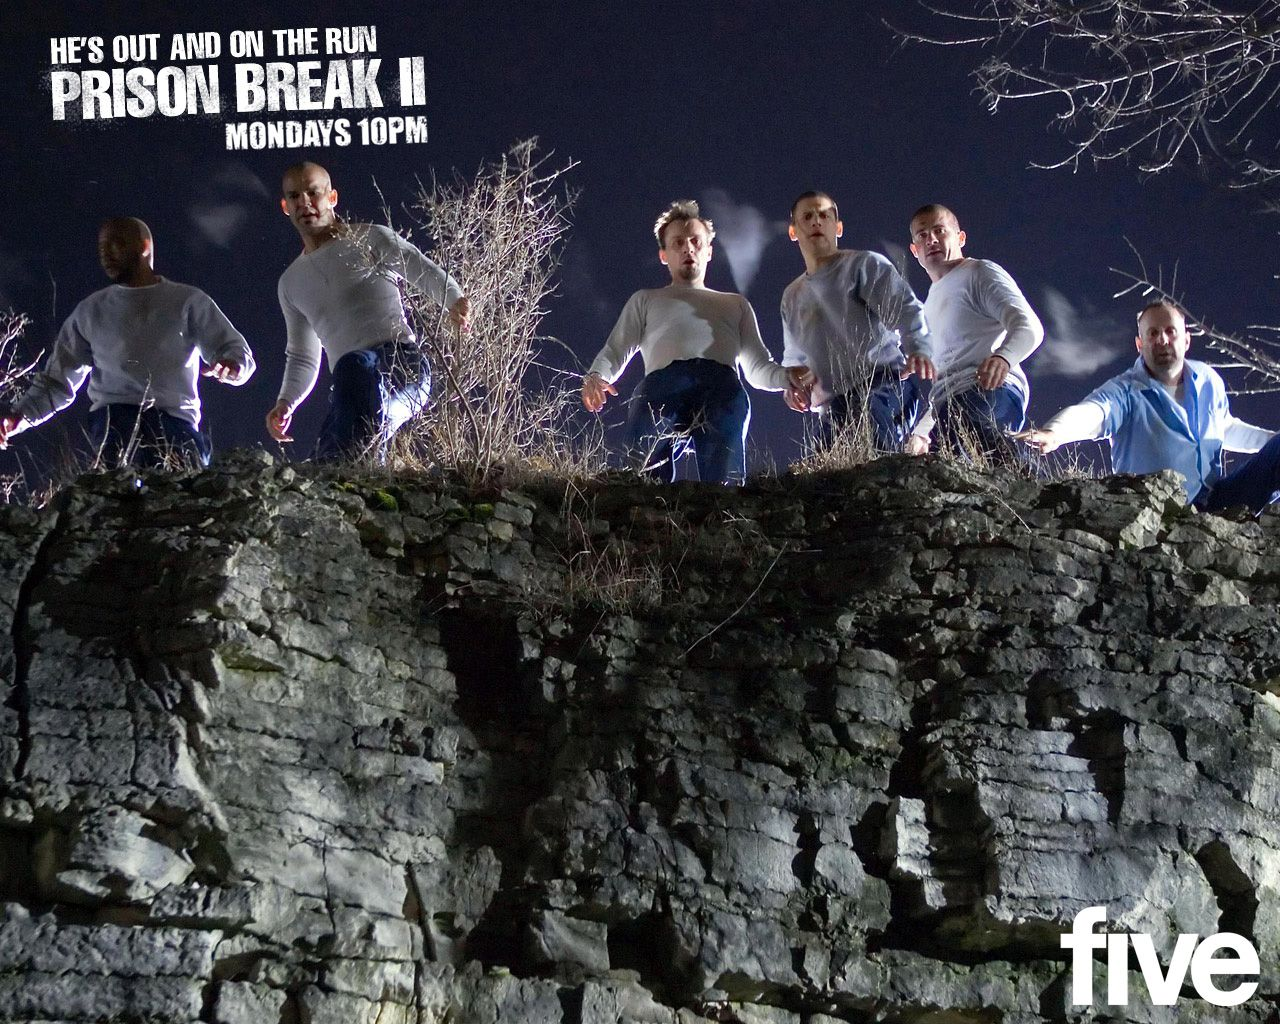 prison break photographs | prison break wallpapers | prison break